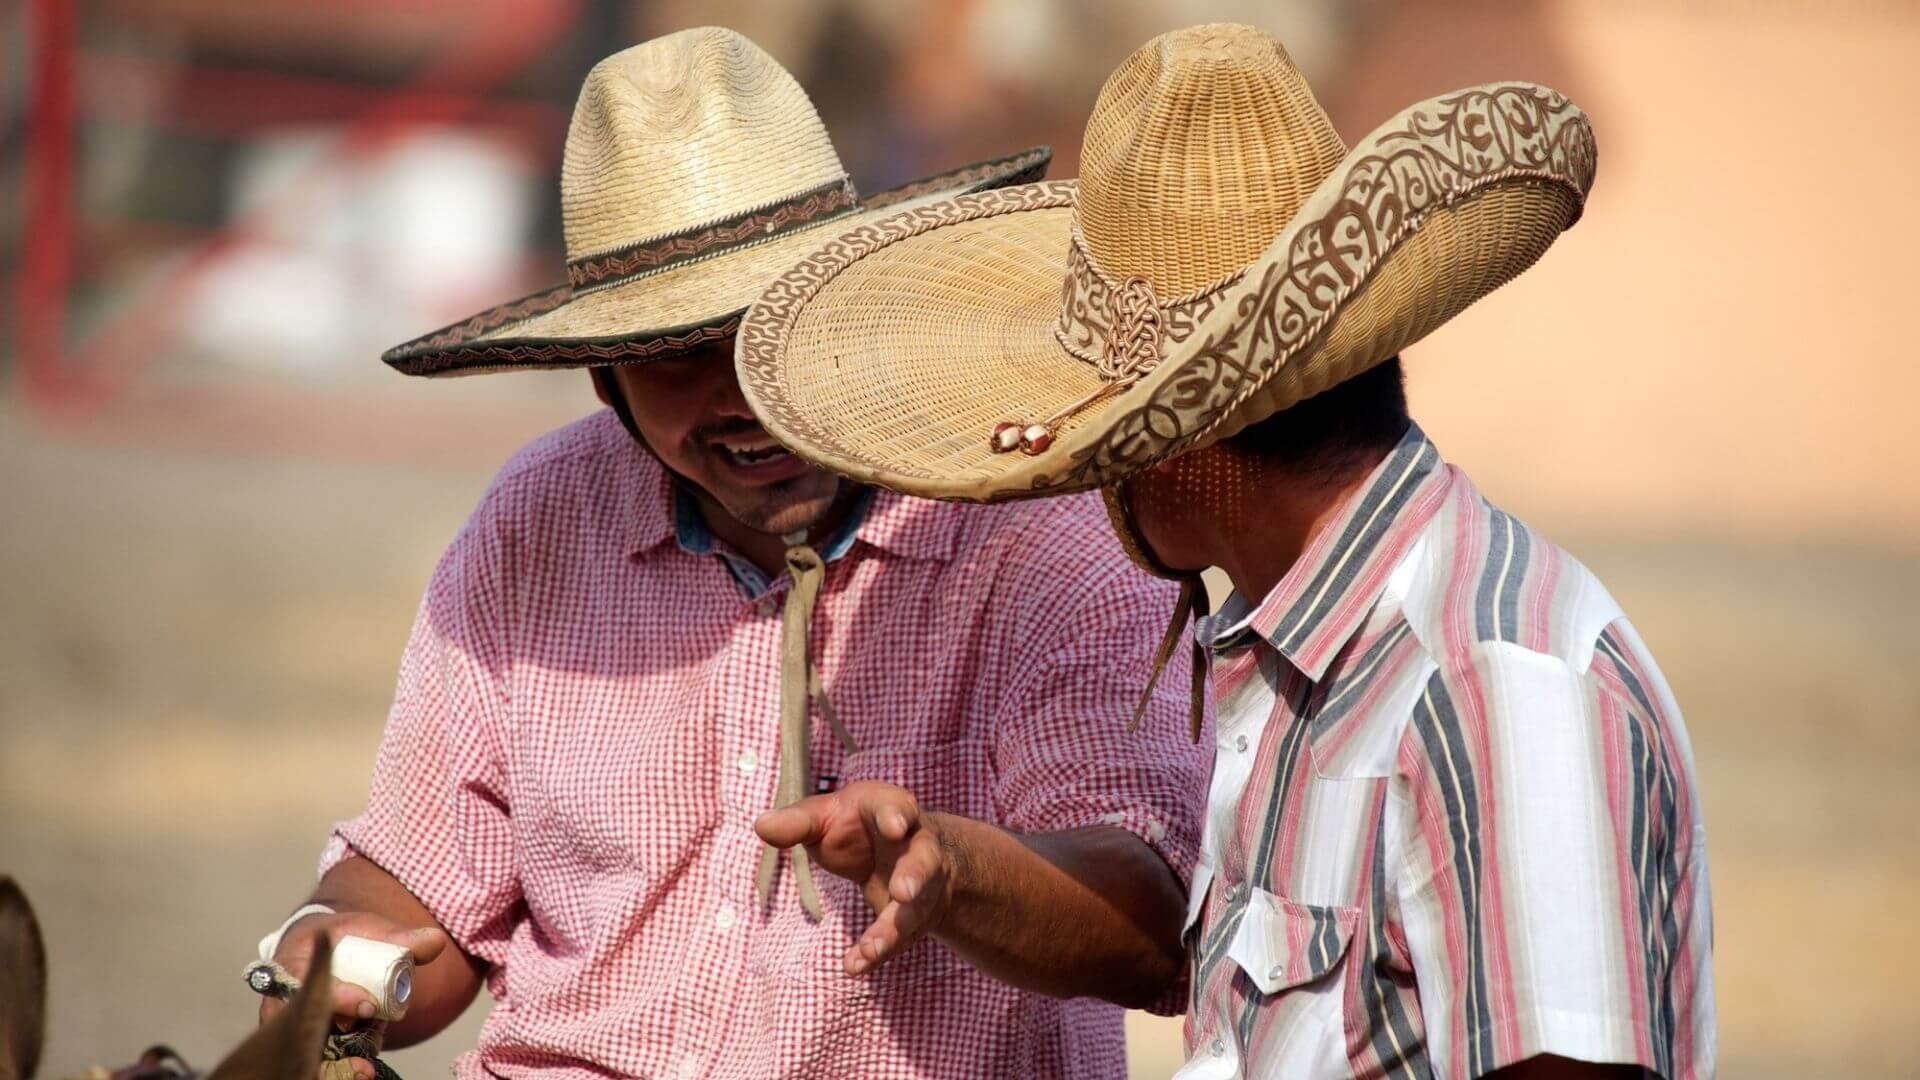 Sombrero - dar vienas Meksikos atributas